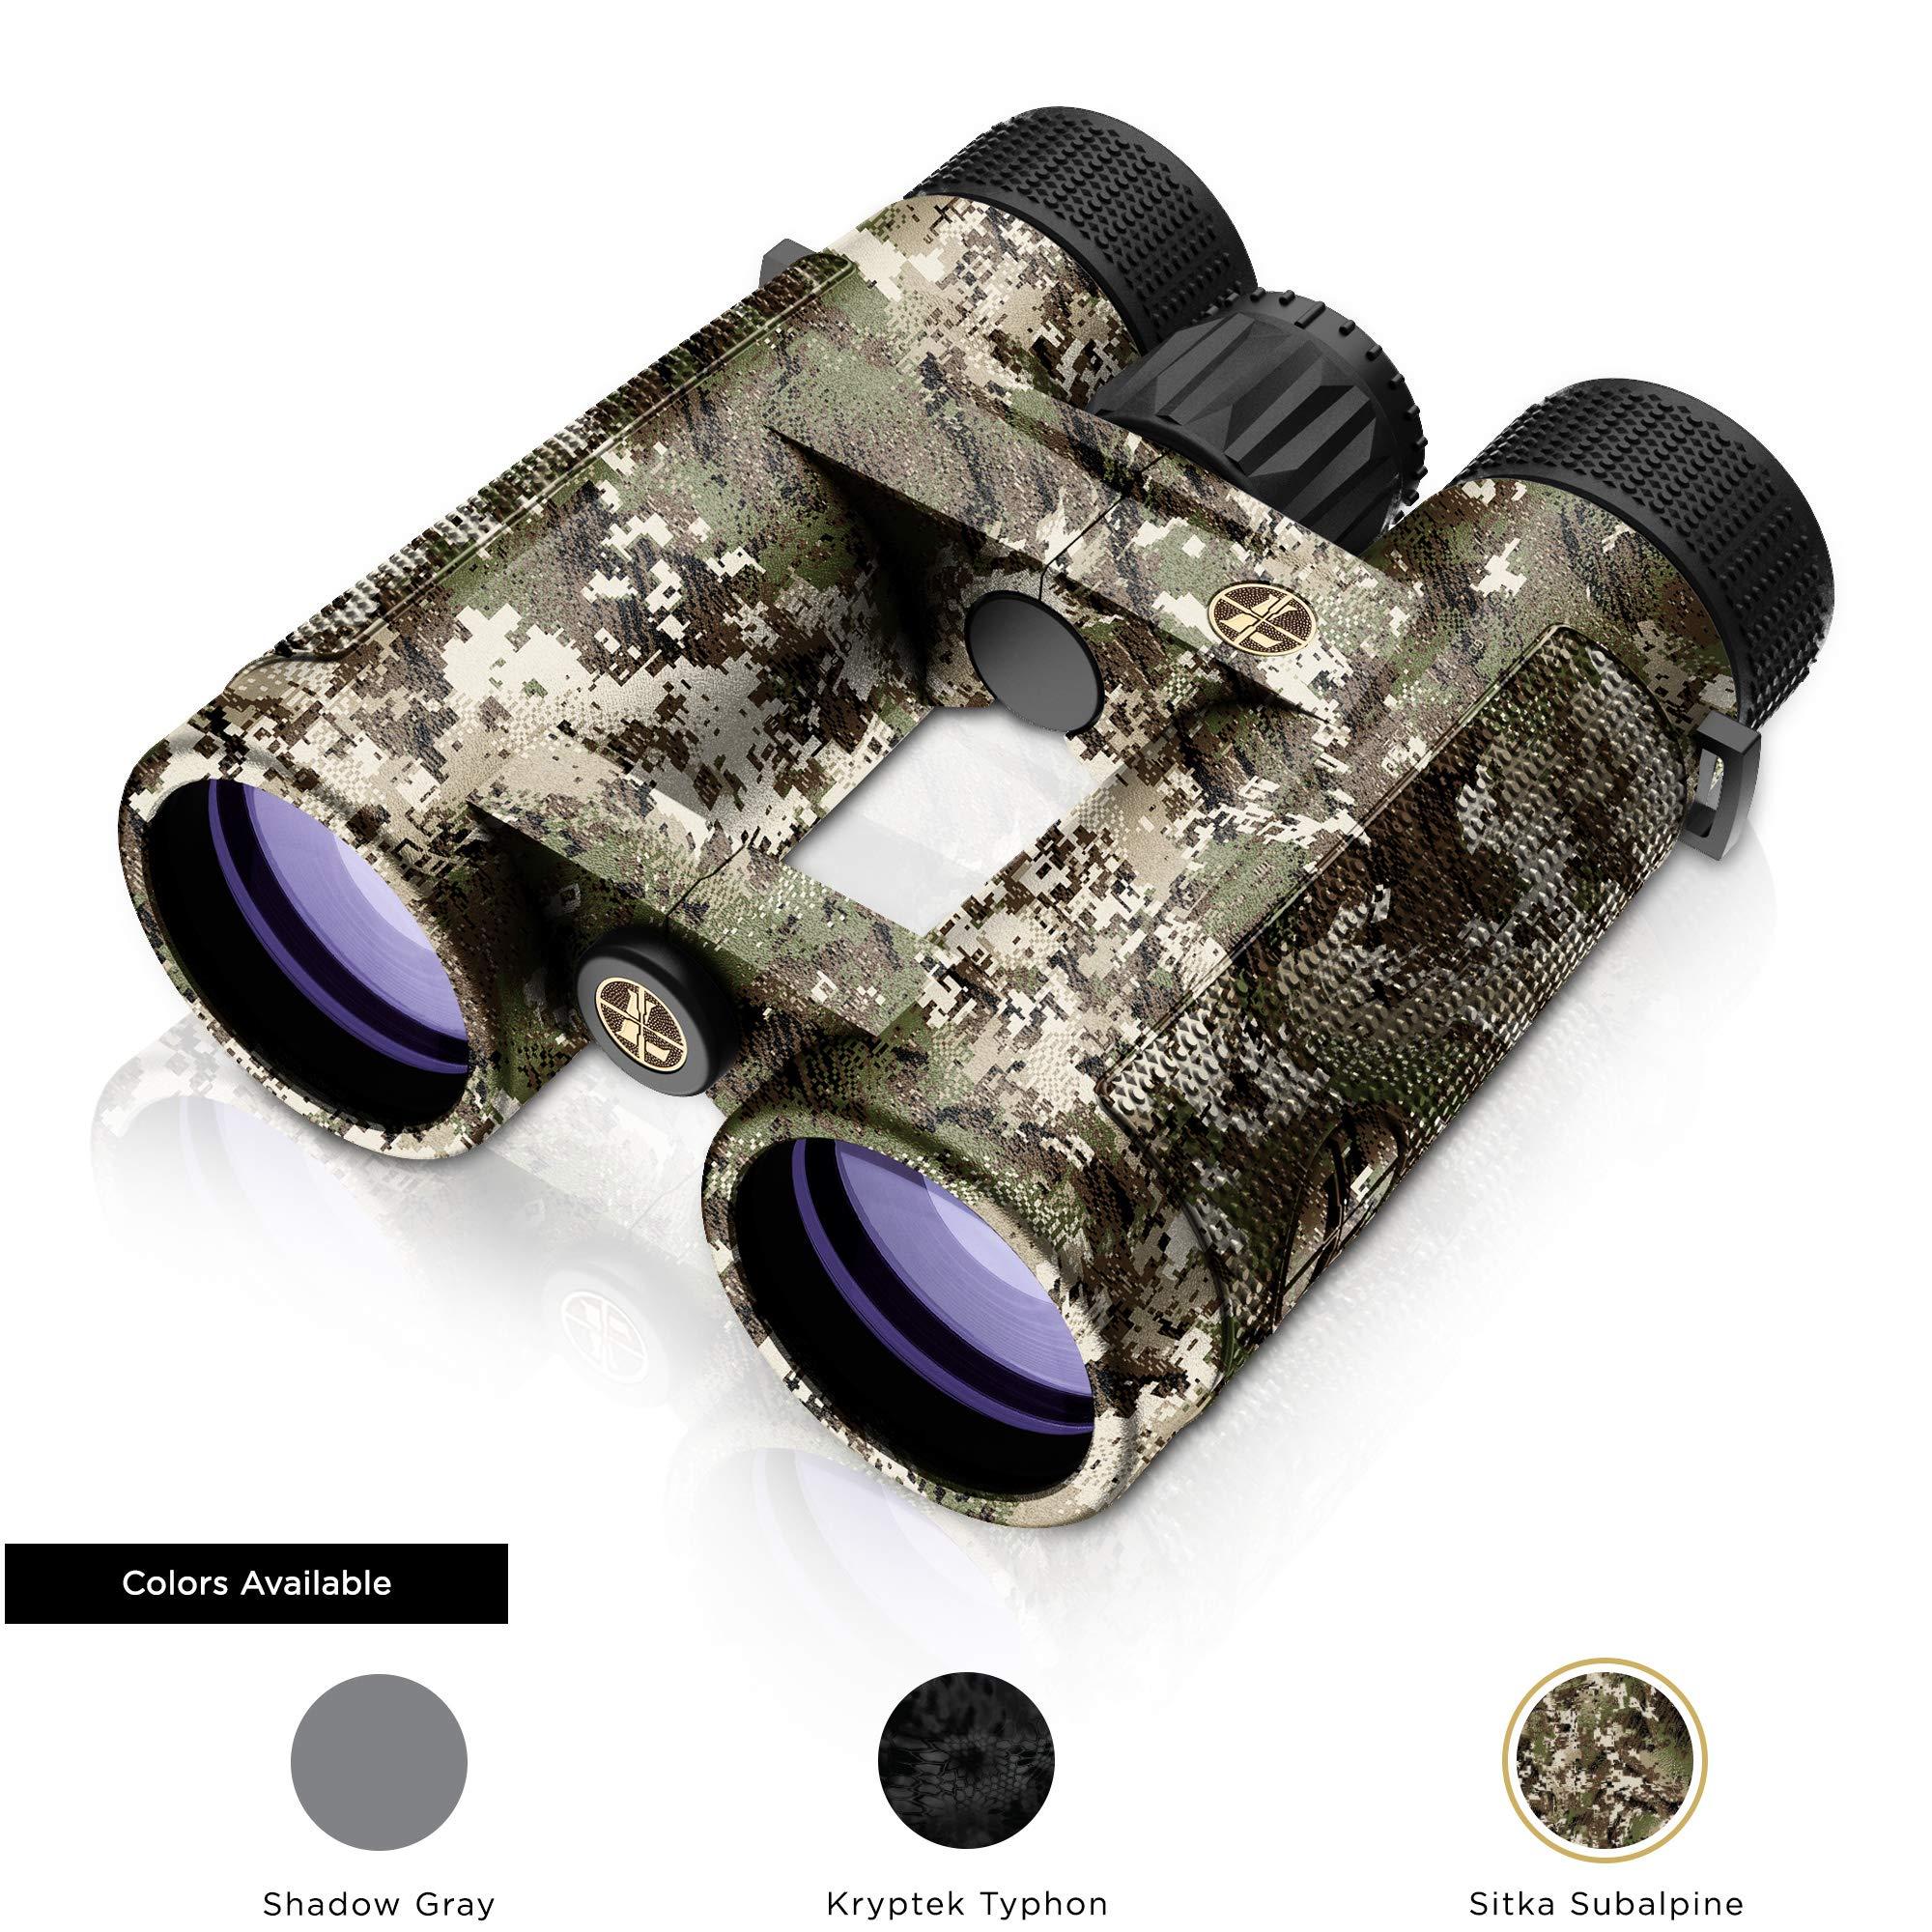 Leupold BX-4 Pro Guide HD 8x42mm Binocular by Leupold